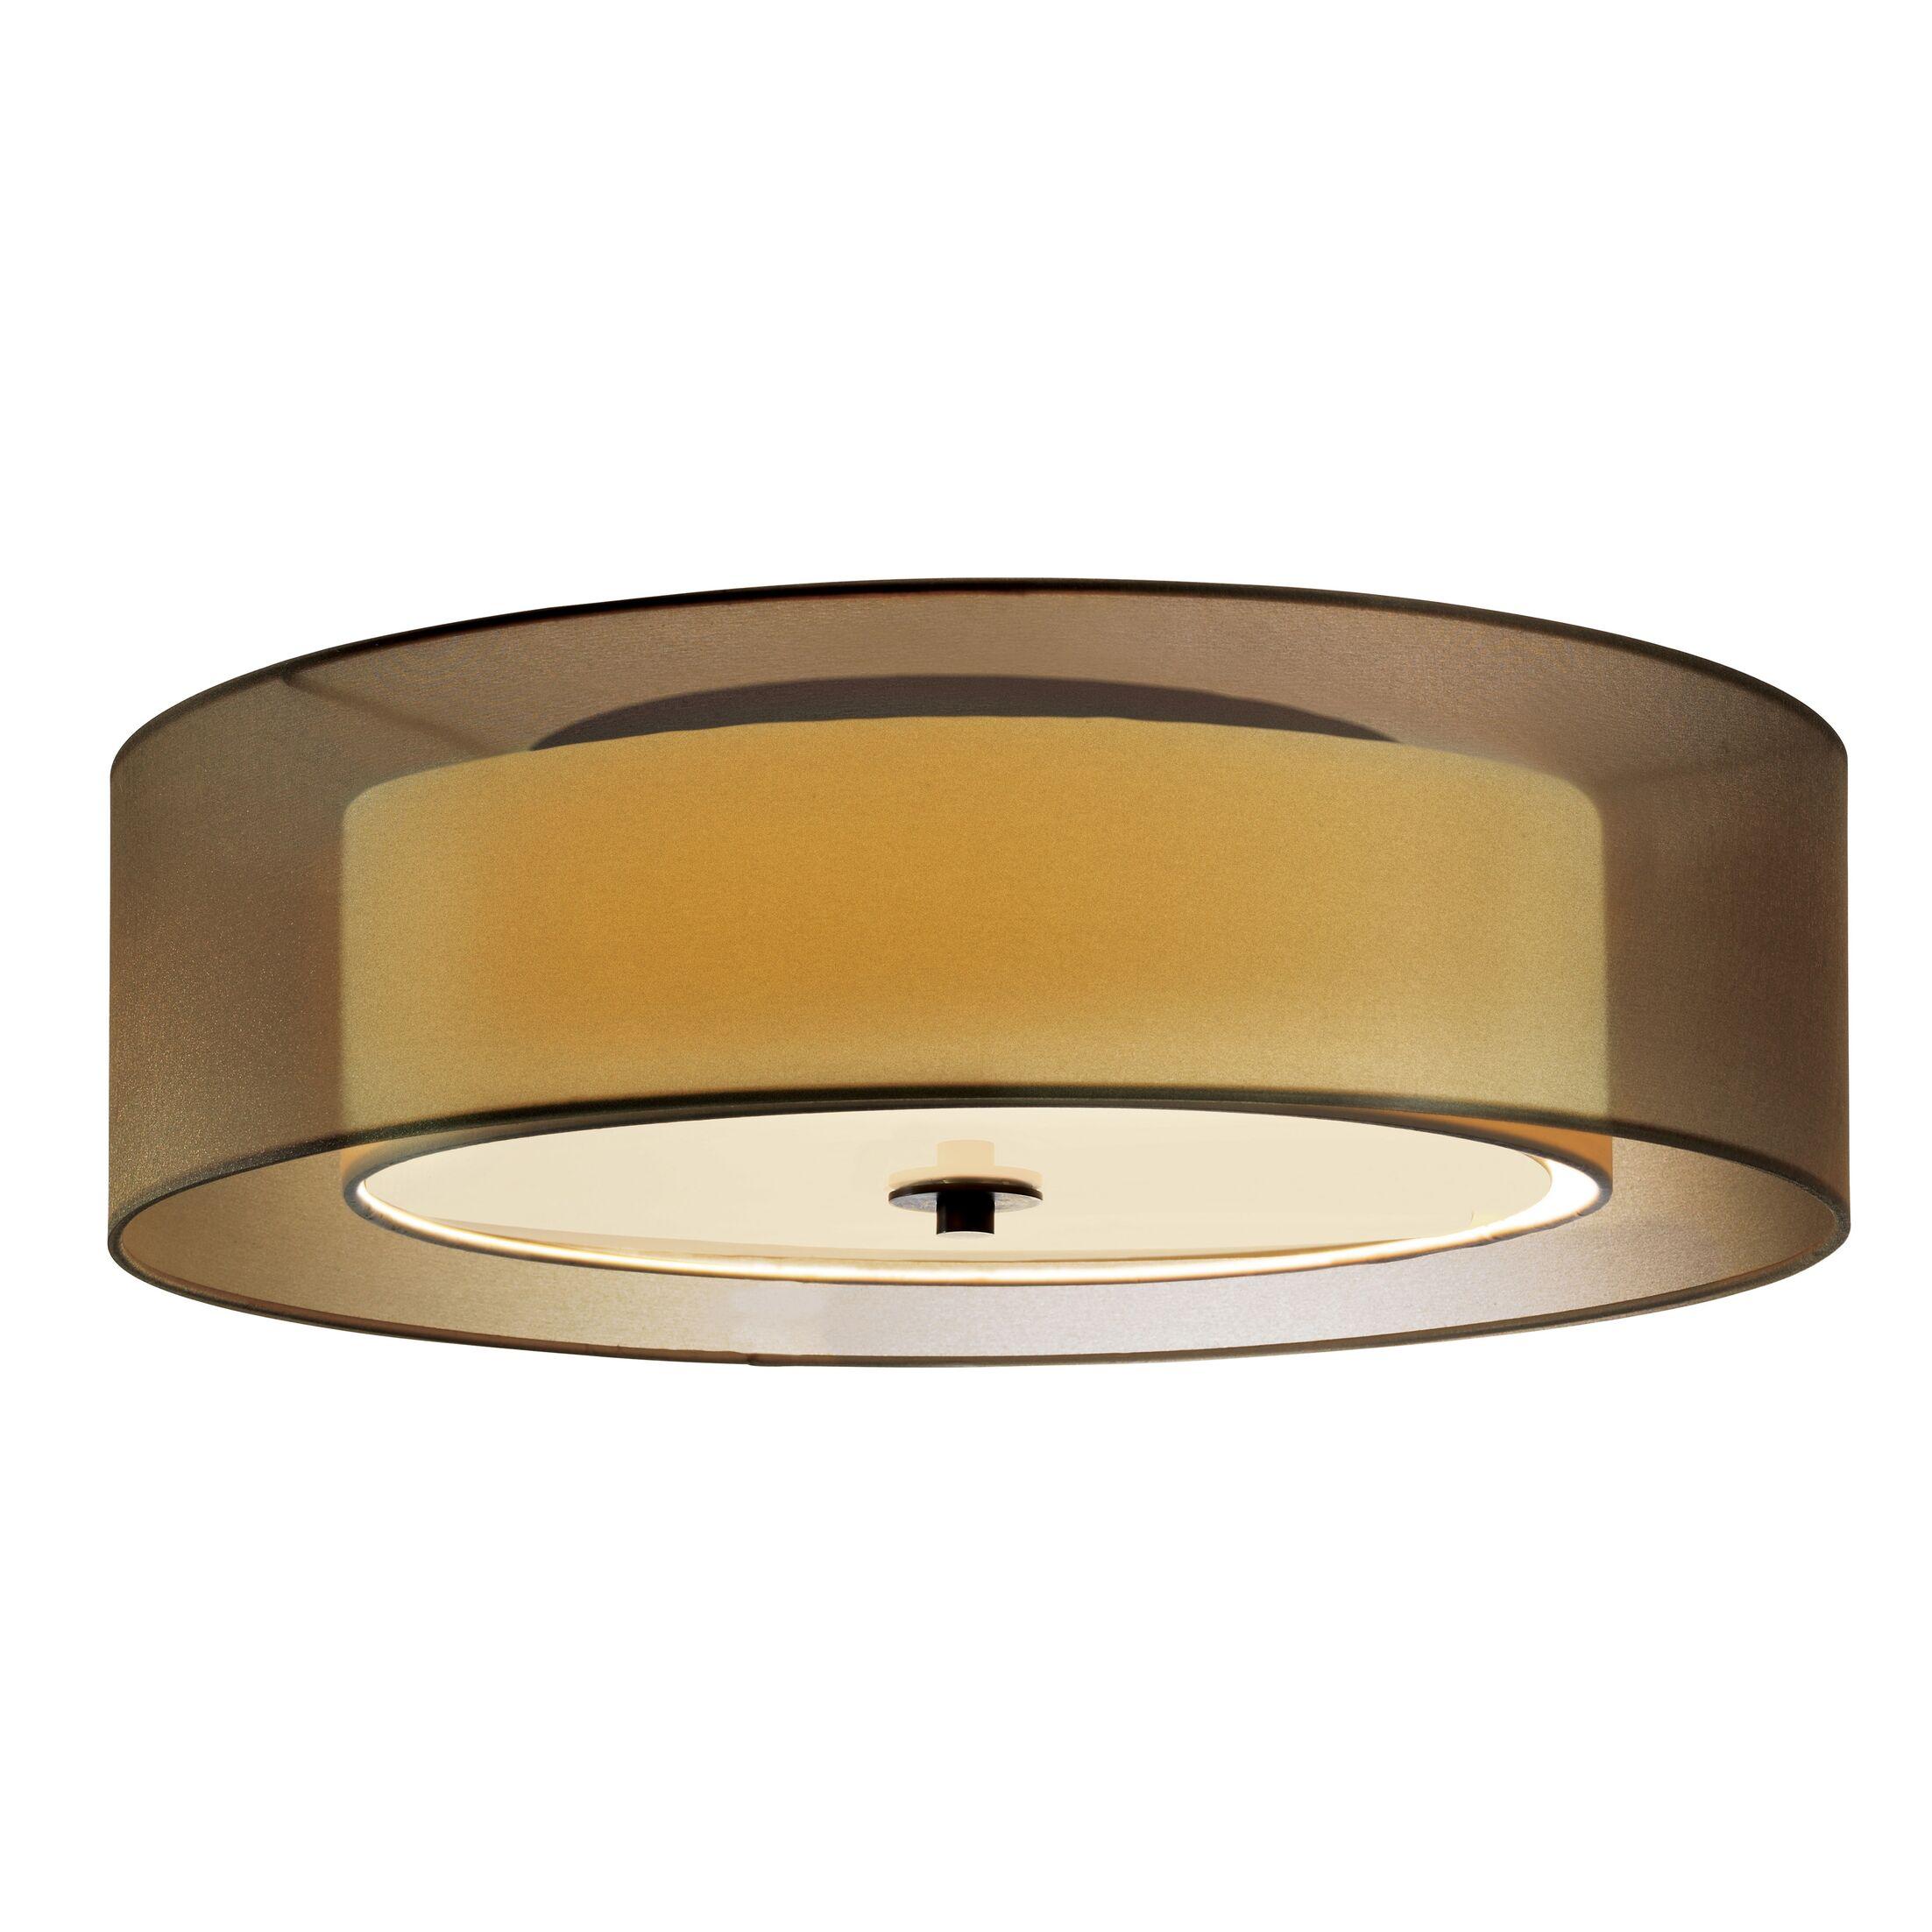 Puri 3-Light Flush Mount Shade Color: Black Brass, Size: 6